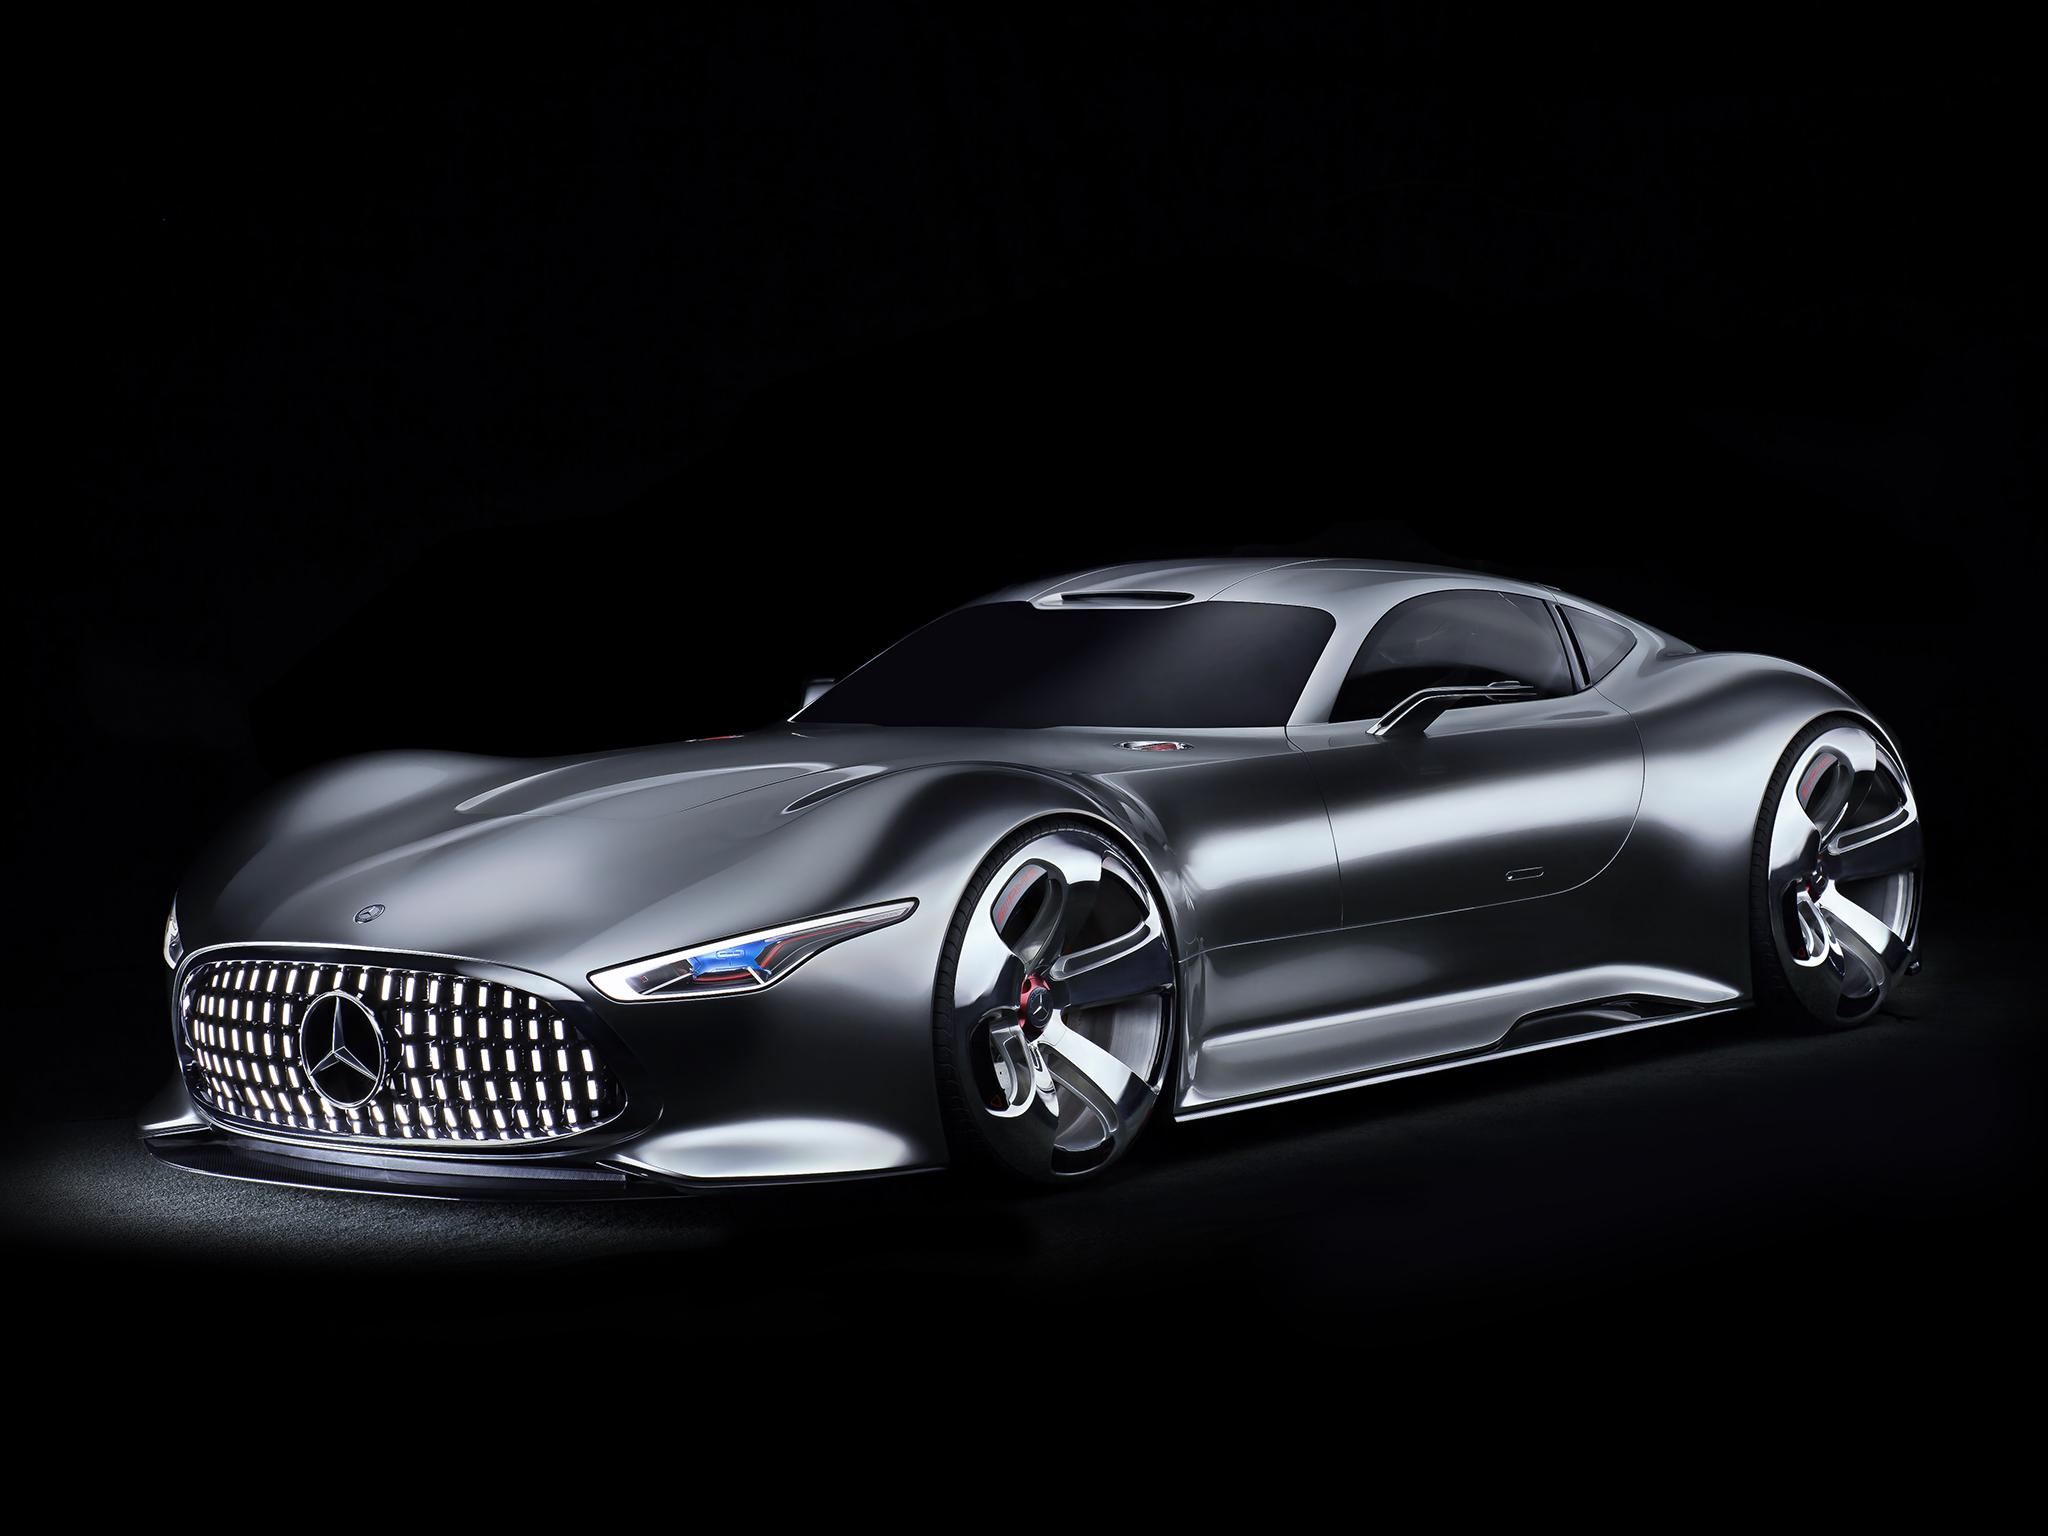 Mercedes Benz AMG Vision Gran Turismo Concept 2048x1536